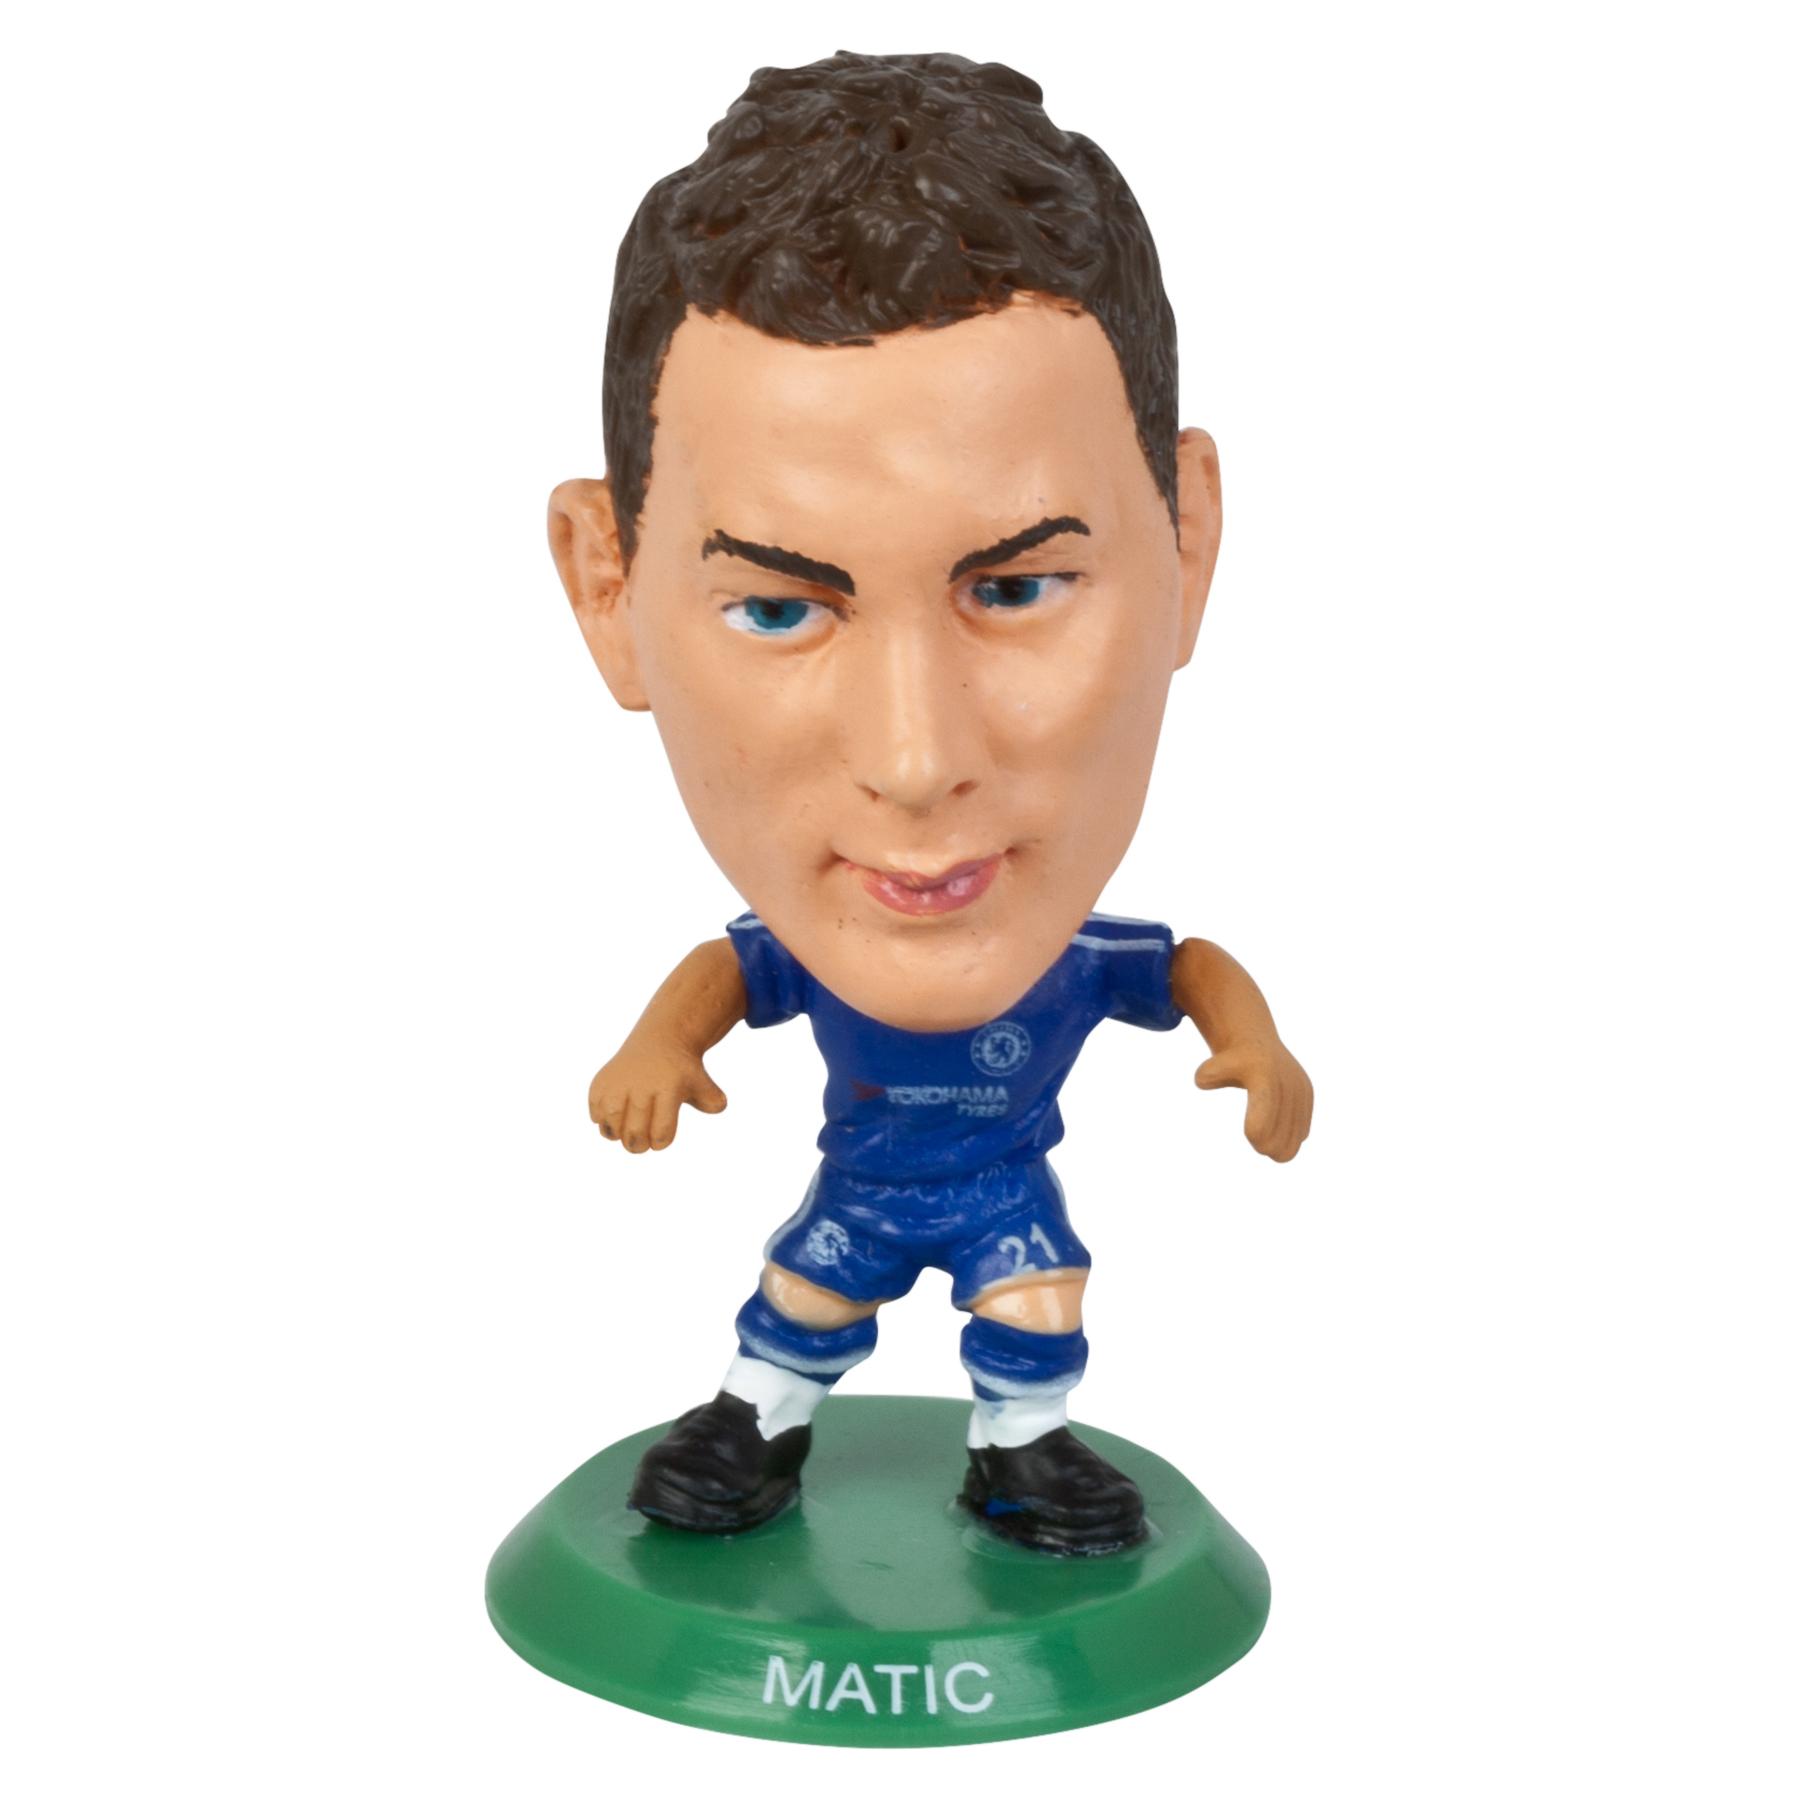 Chelsea Matic Home SoccerStarz